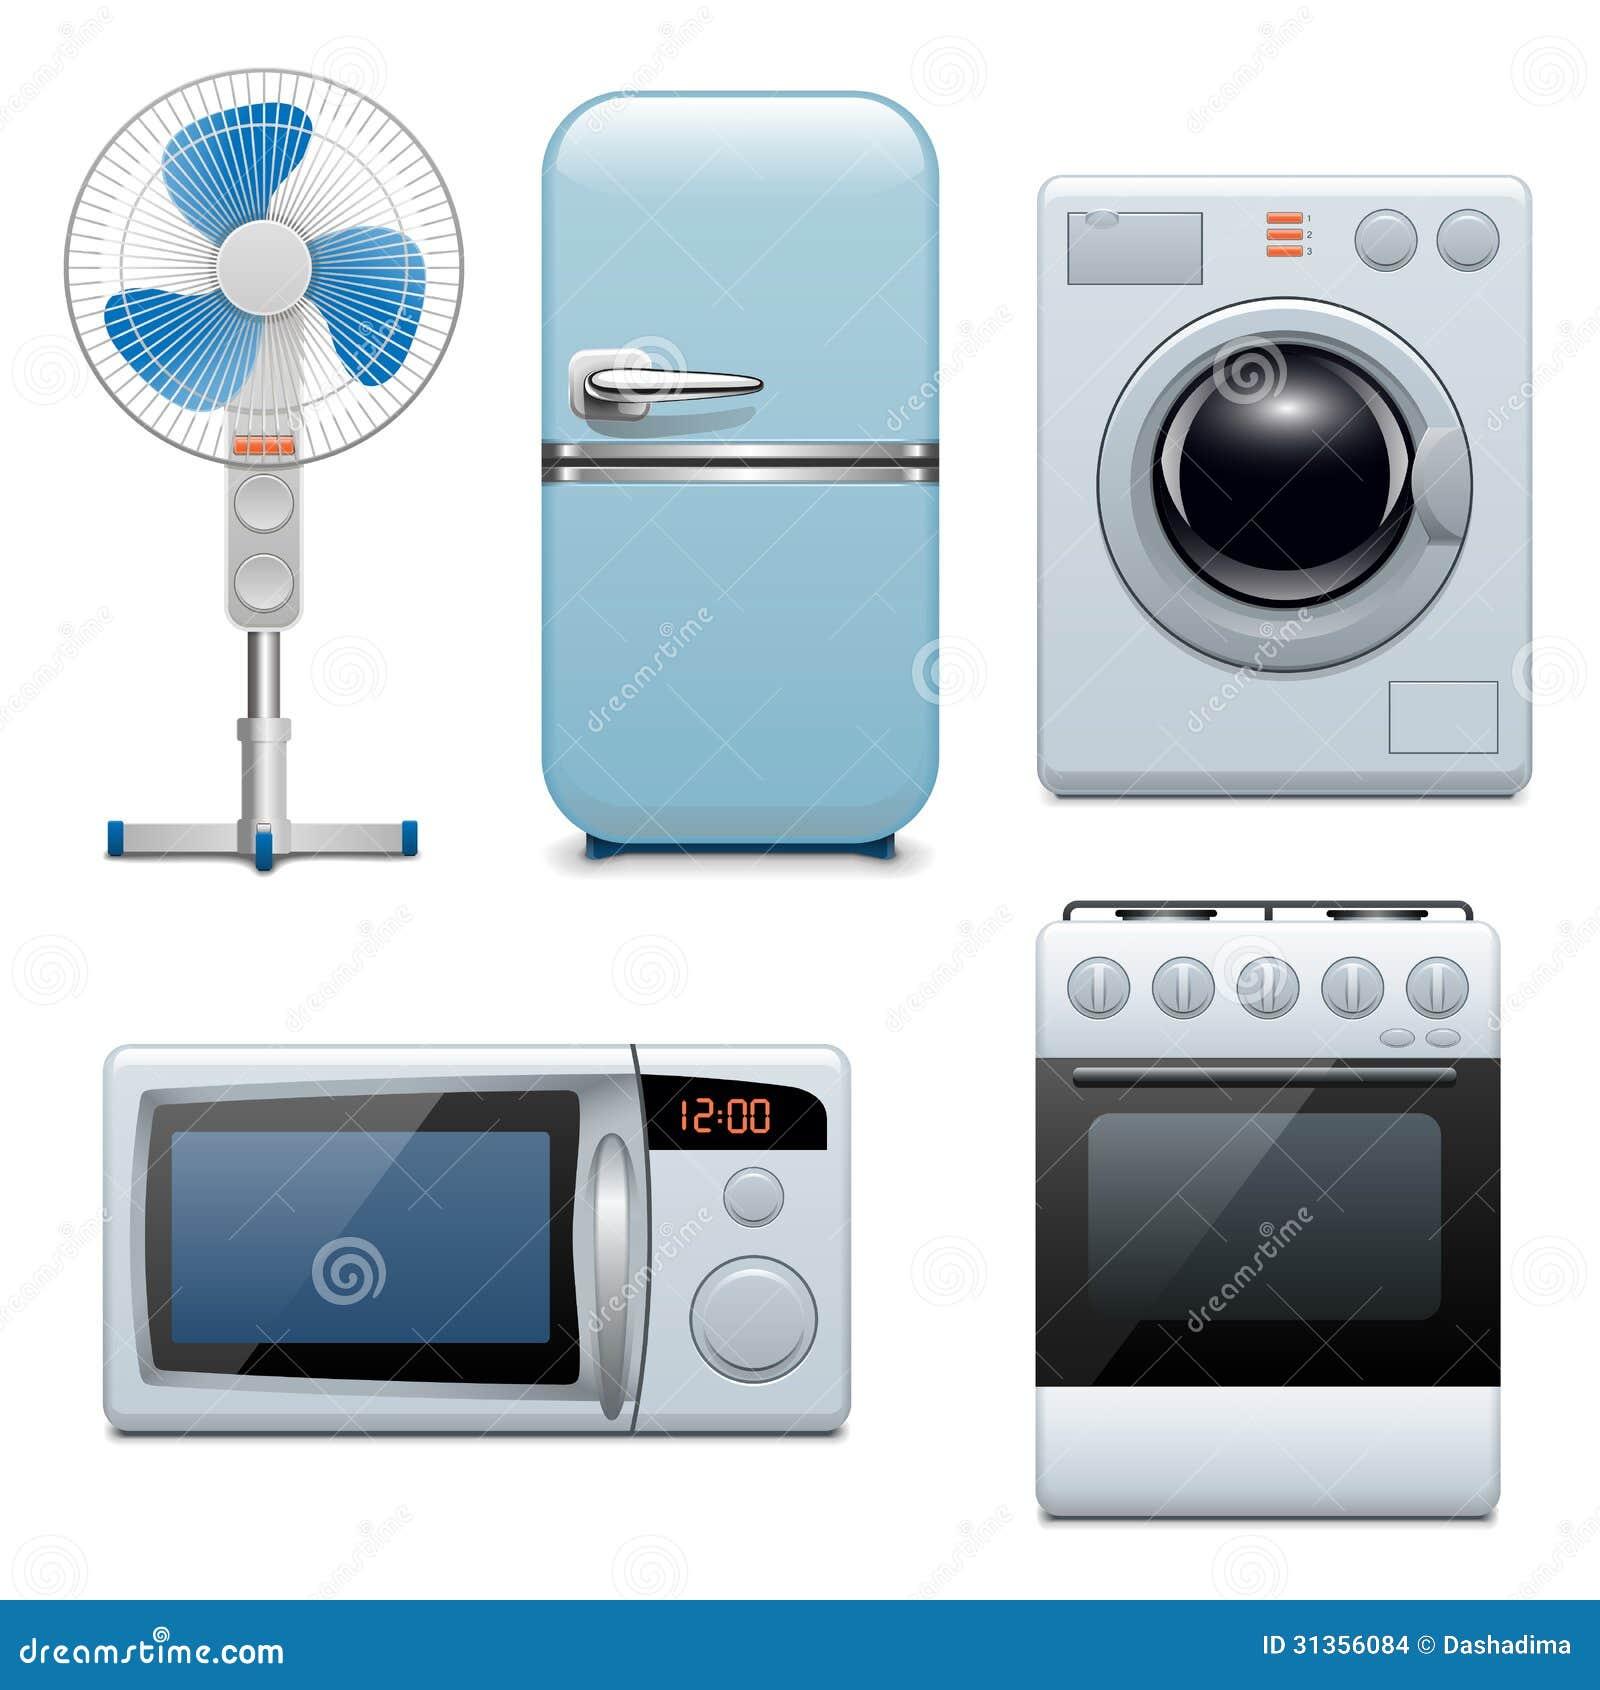 Kitchen Appliance Review Website